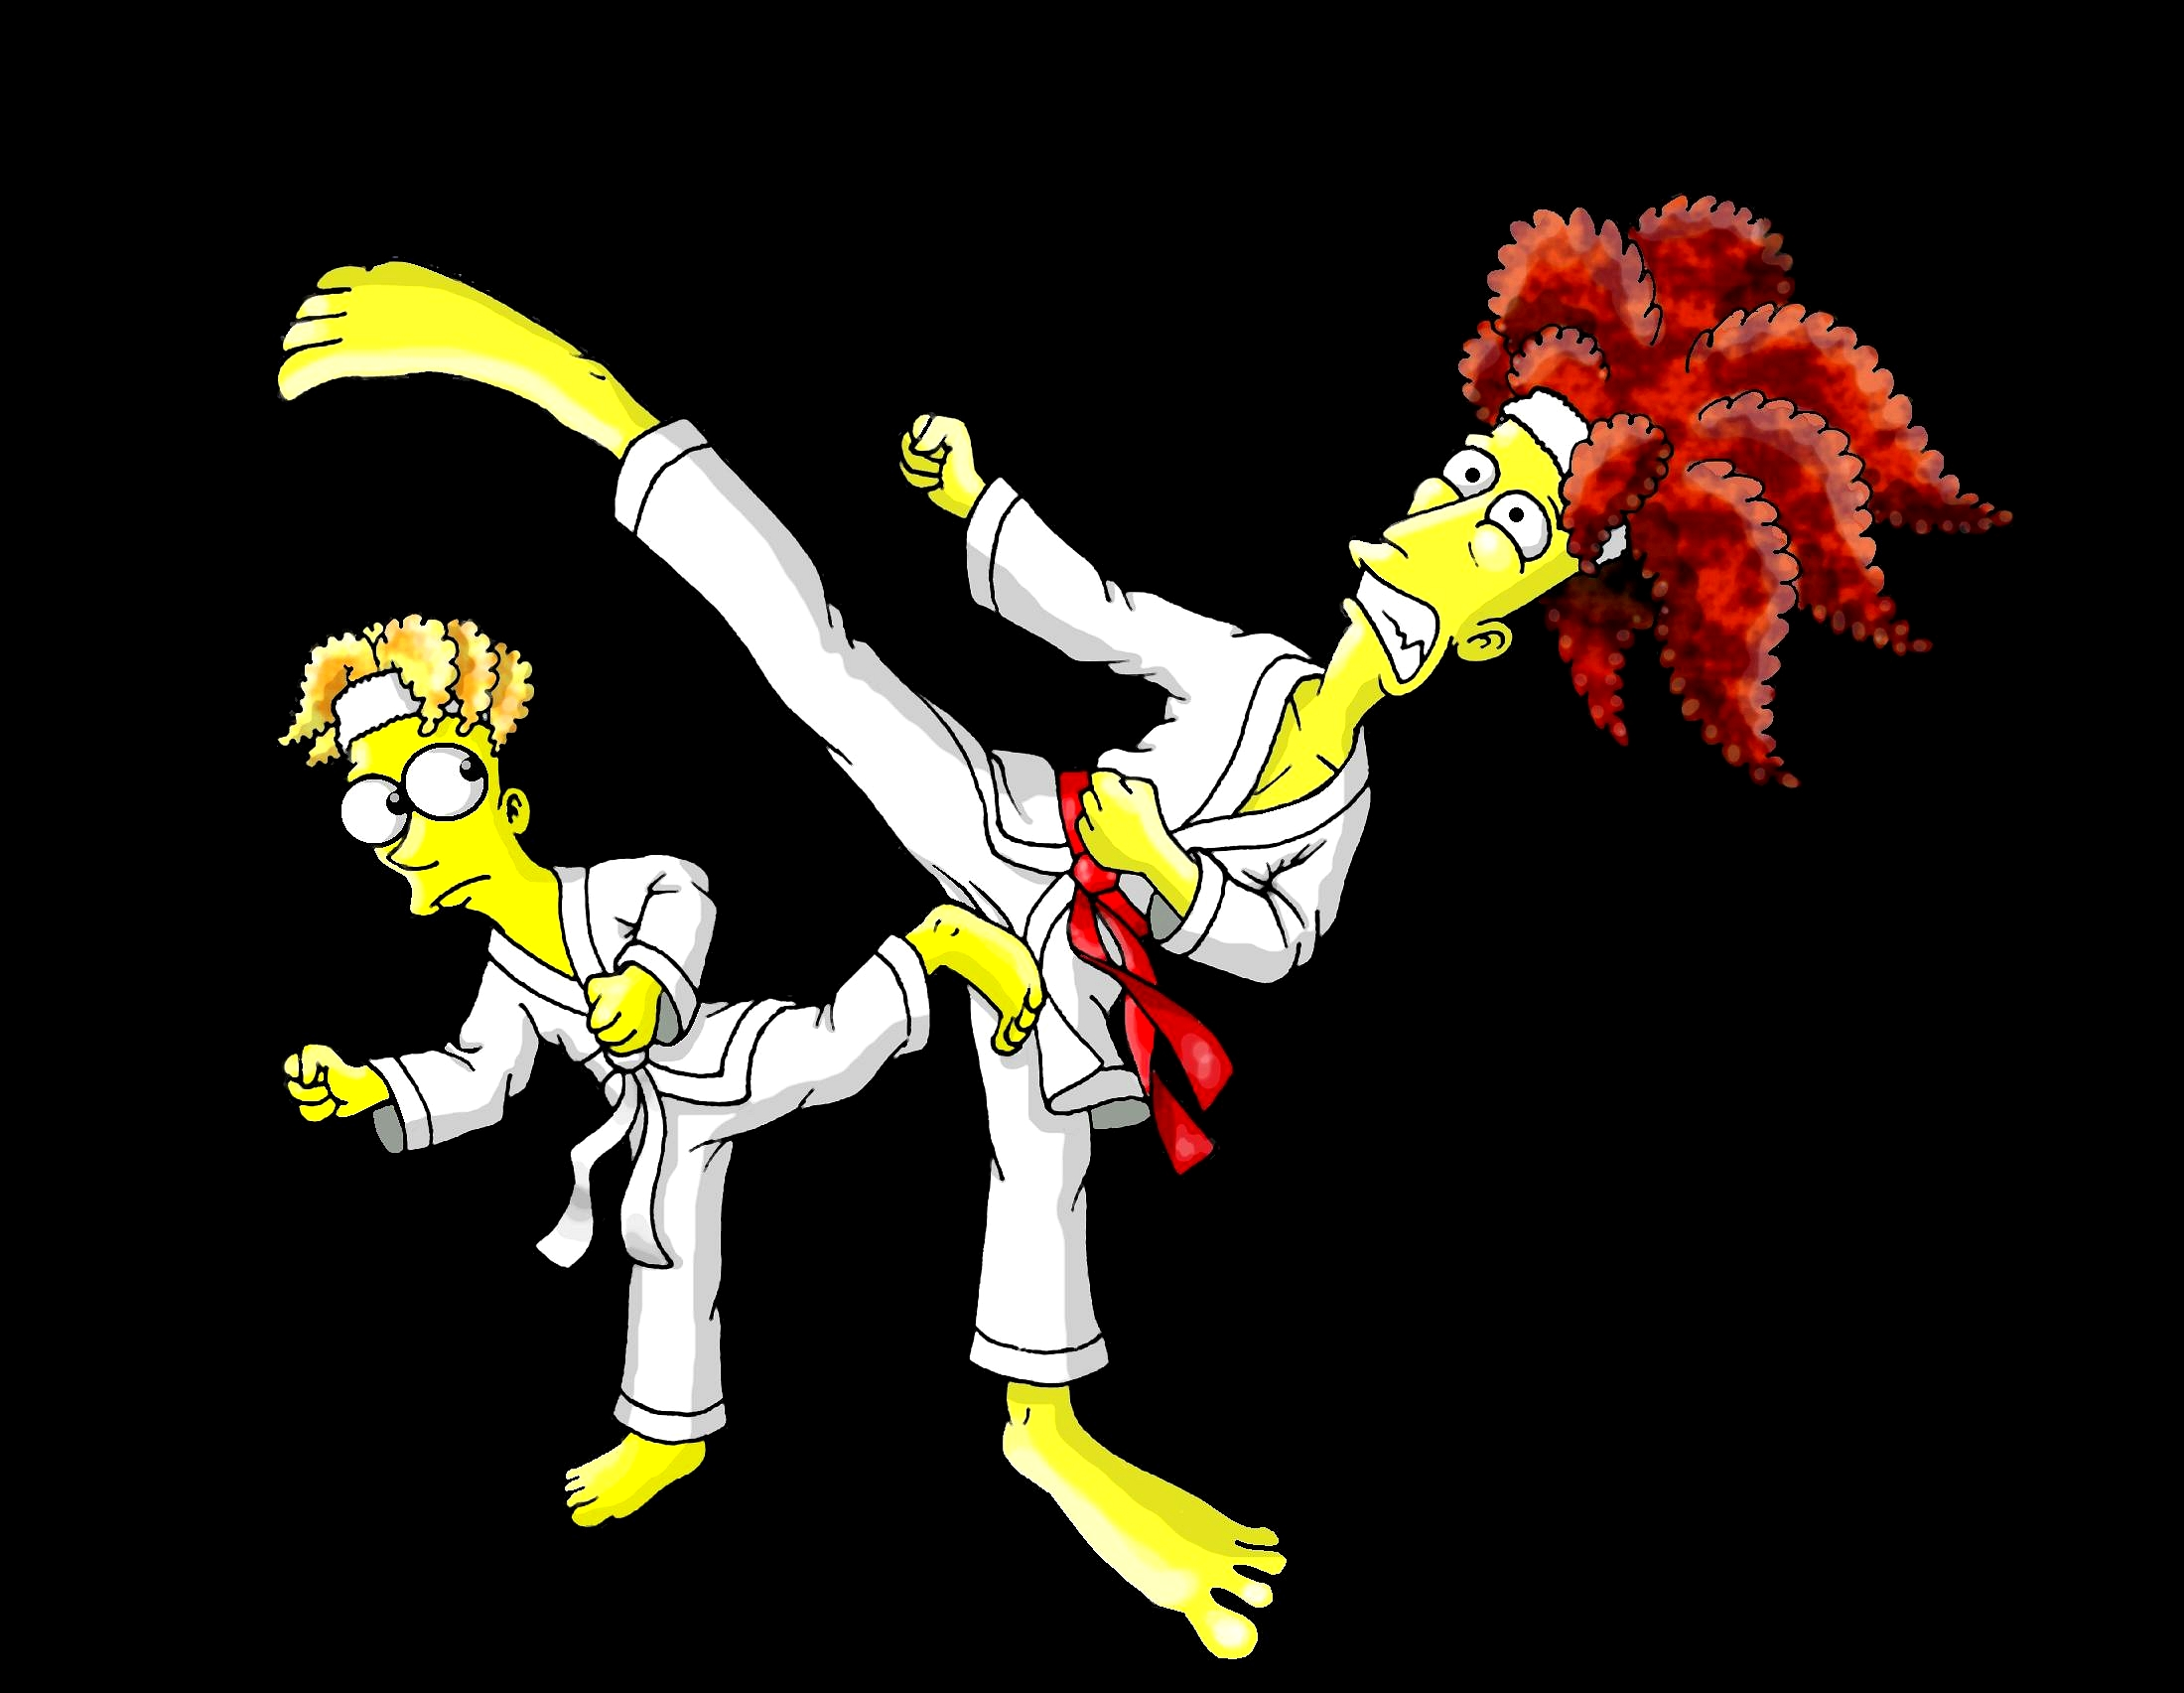 Karate Kicks by Nevuela